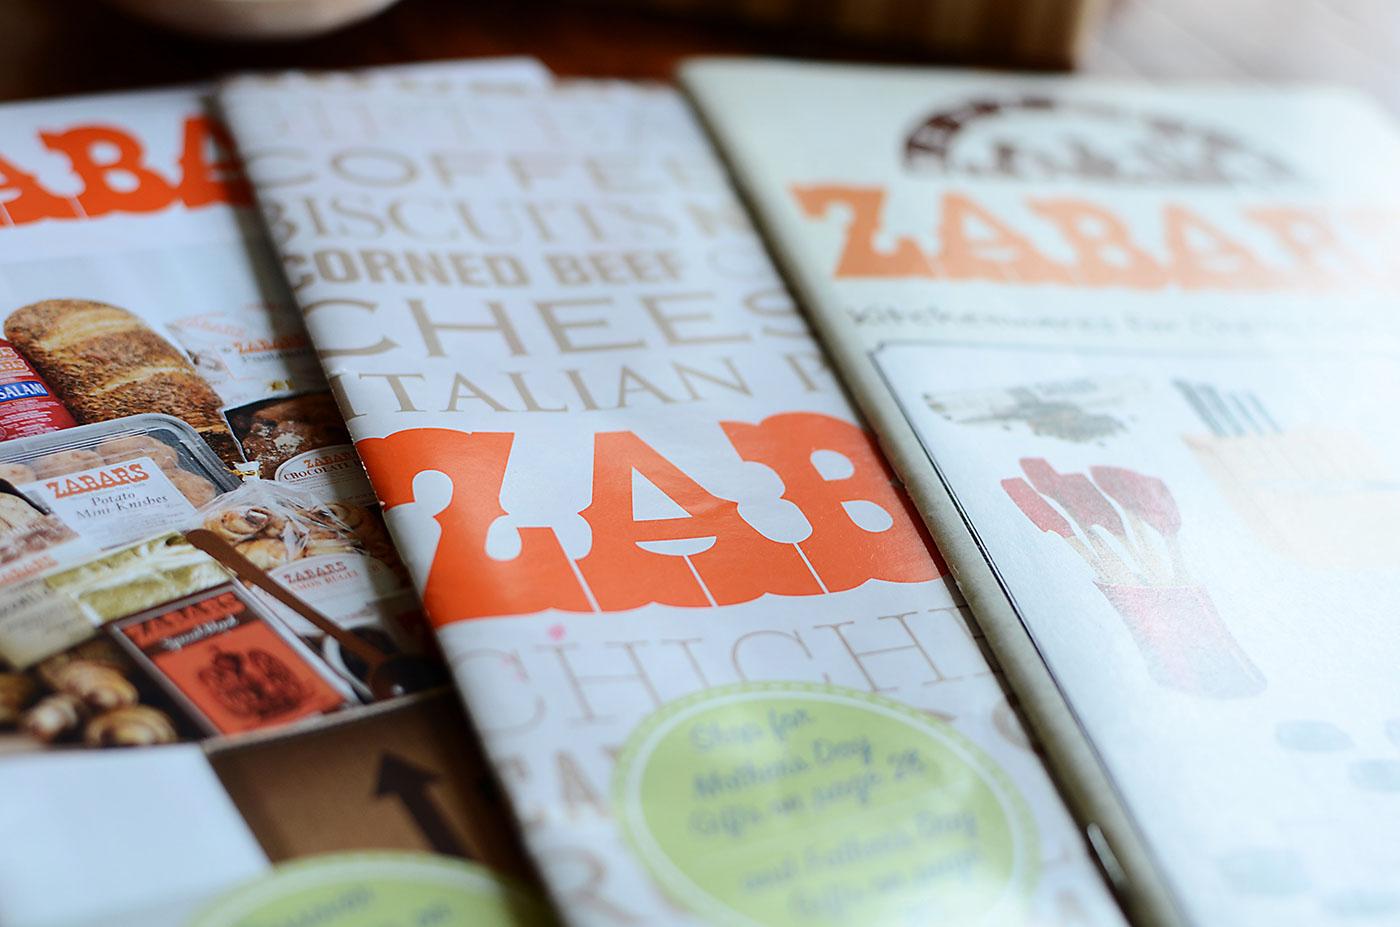 Close up of various Zabar's catalog cover designs